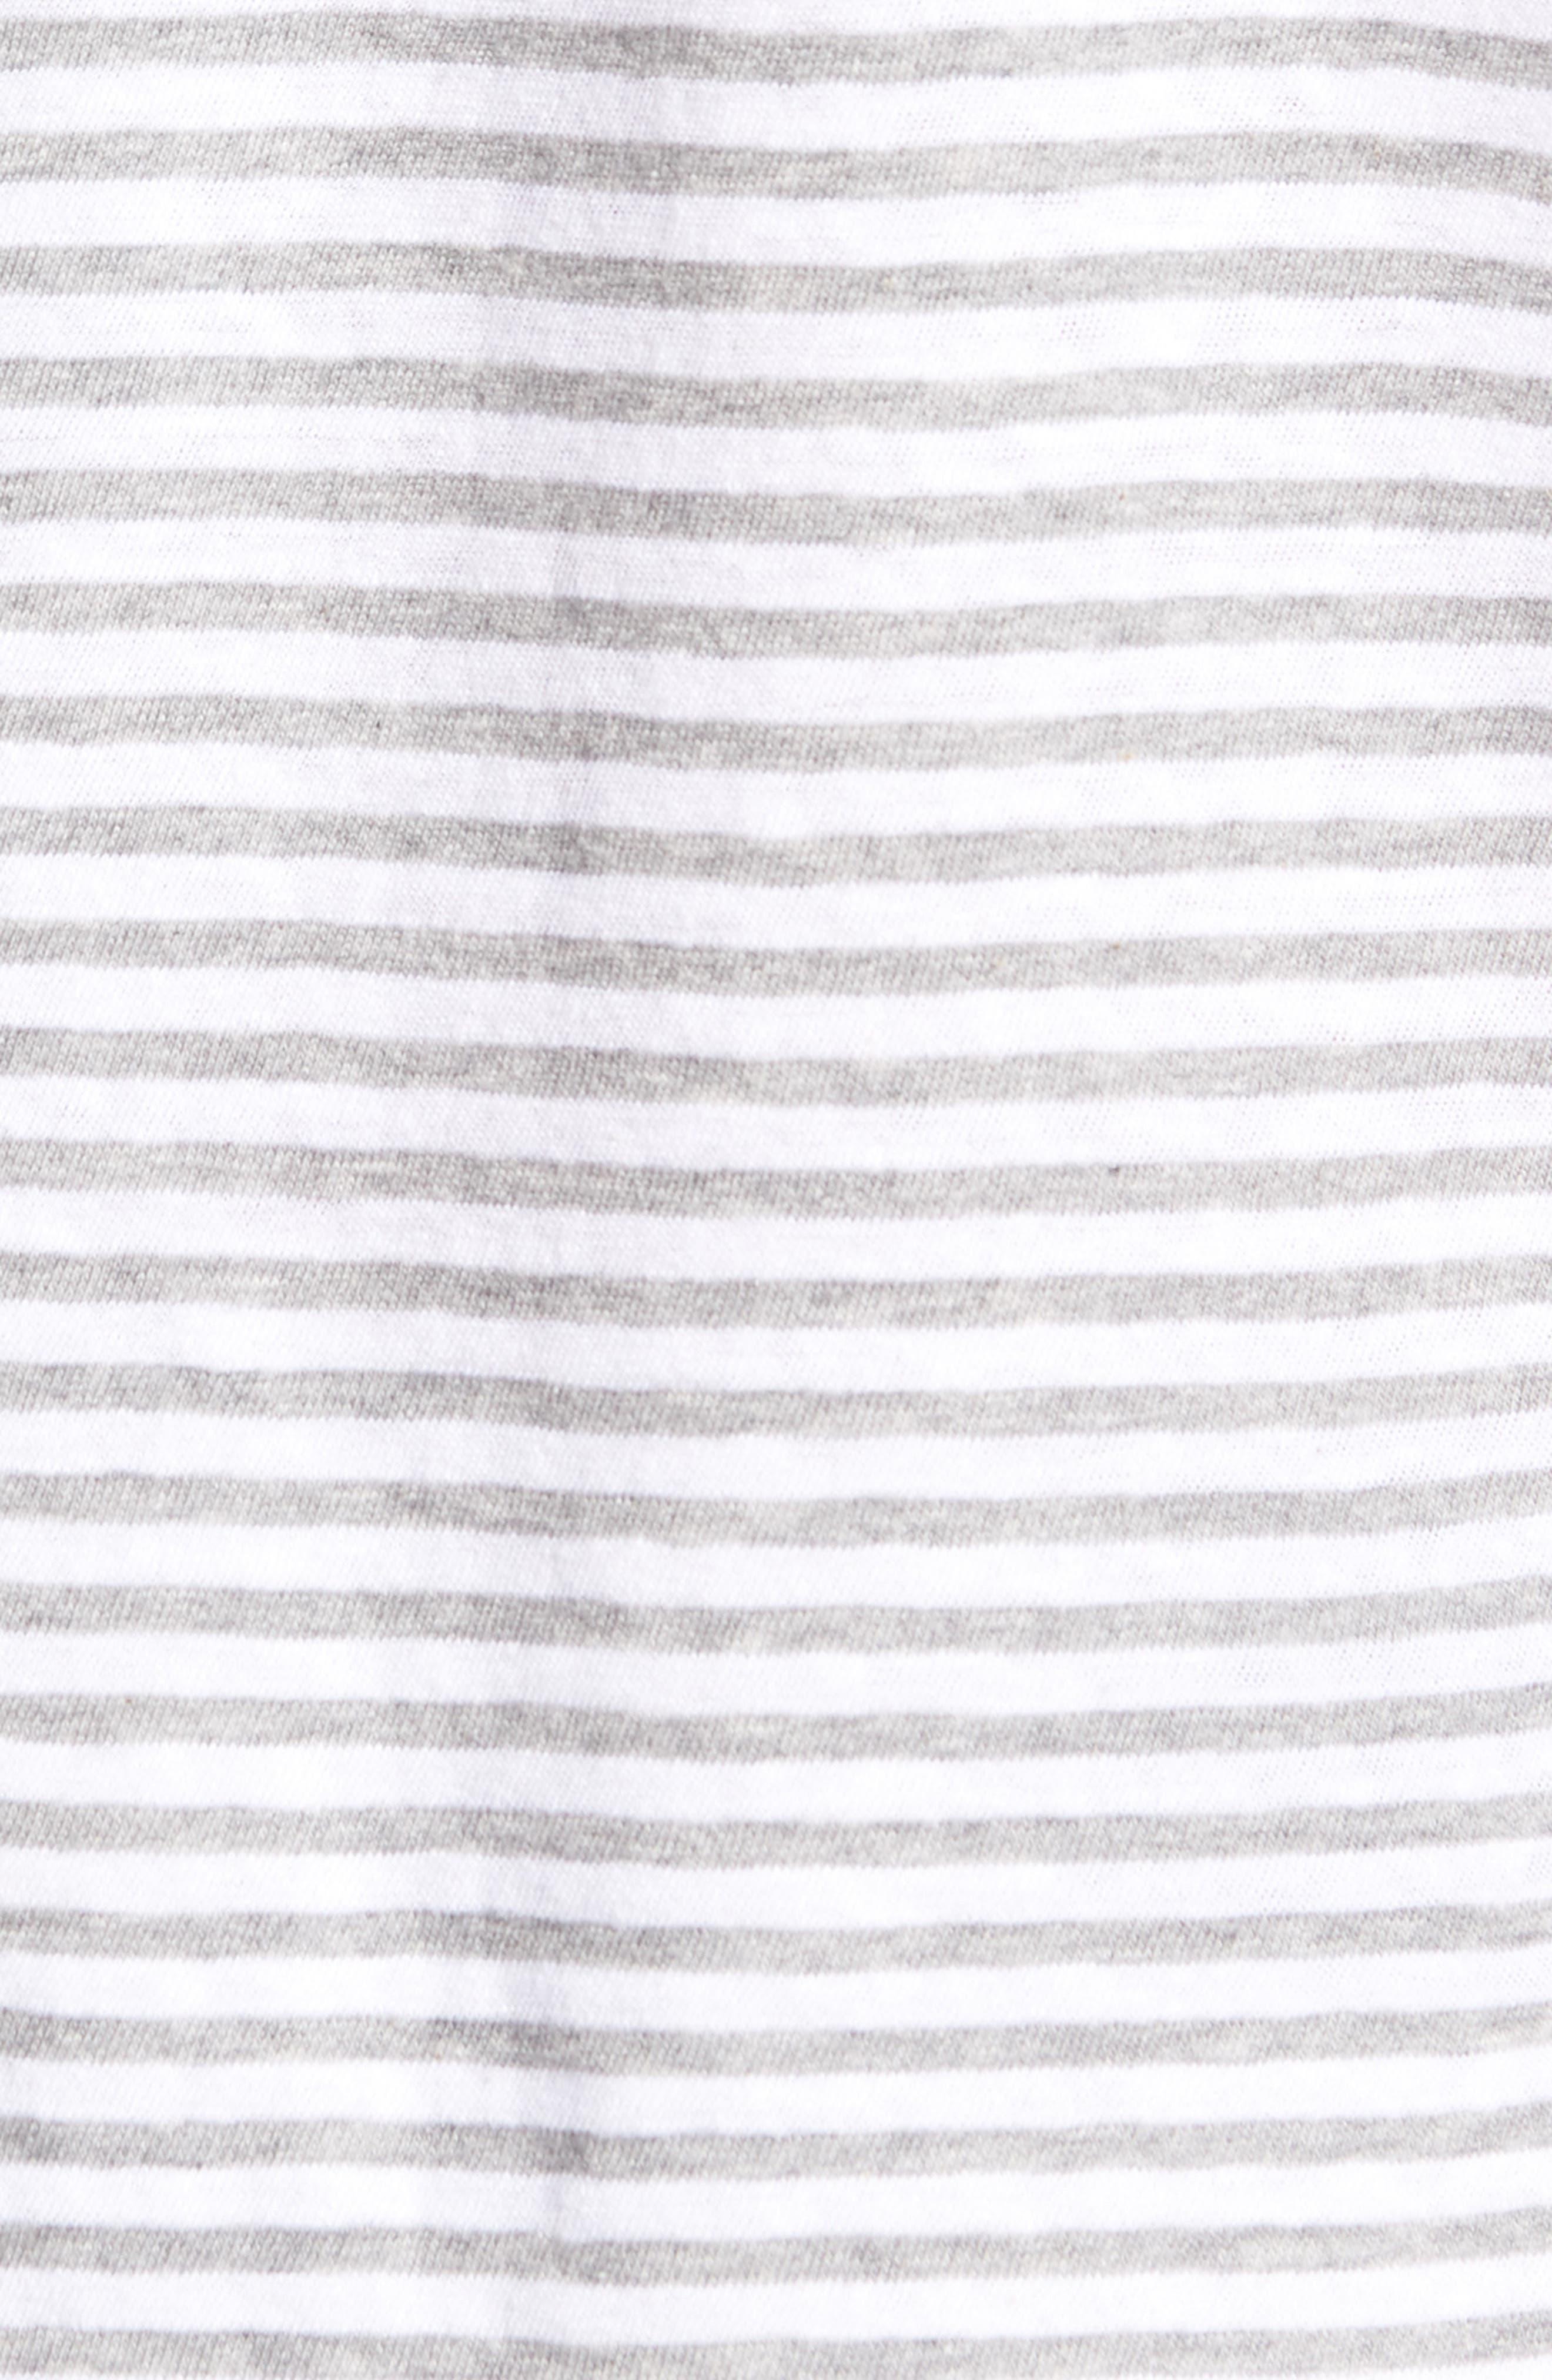 & Bros. Stripe Crewneck T-Shirt,                             Alternate thumbnail 5, color,                             156